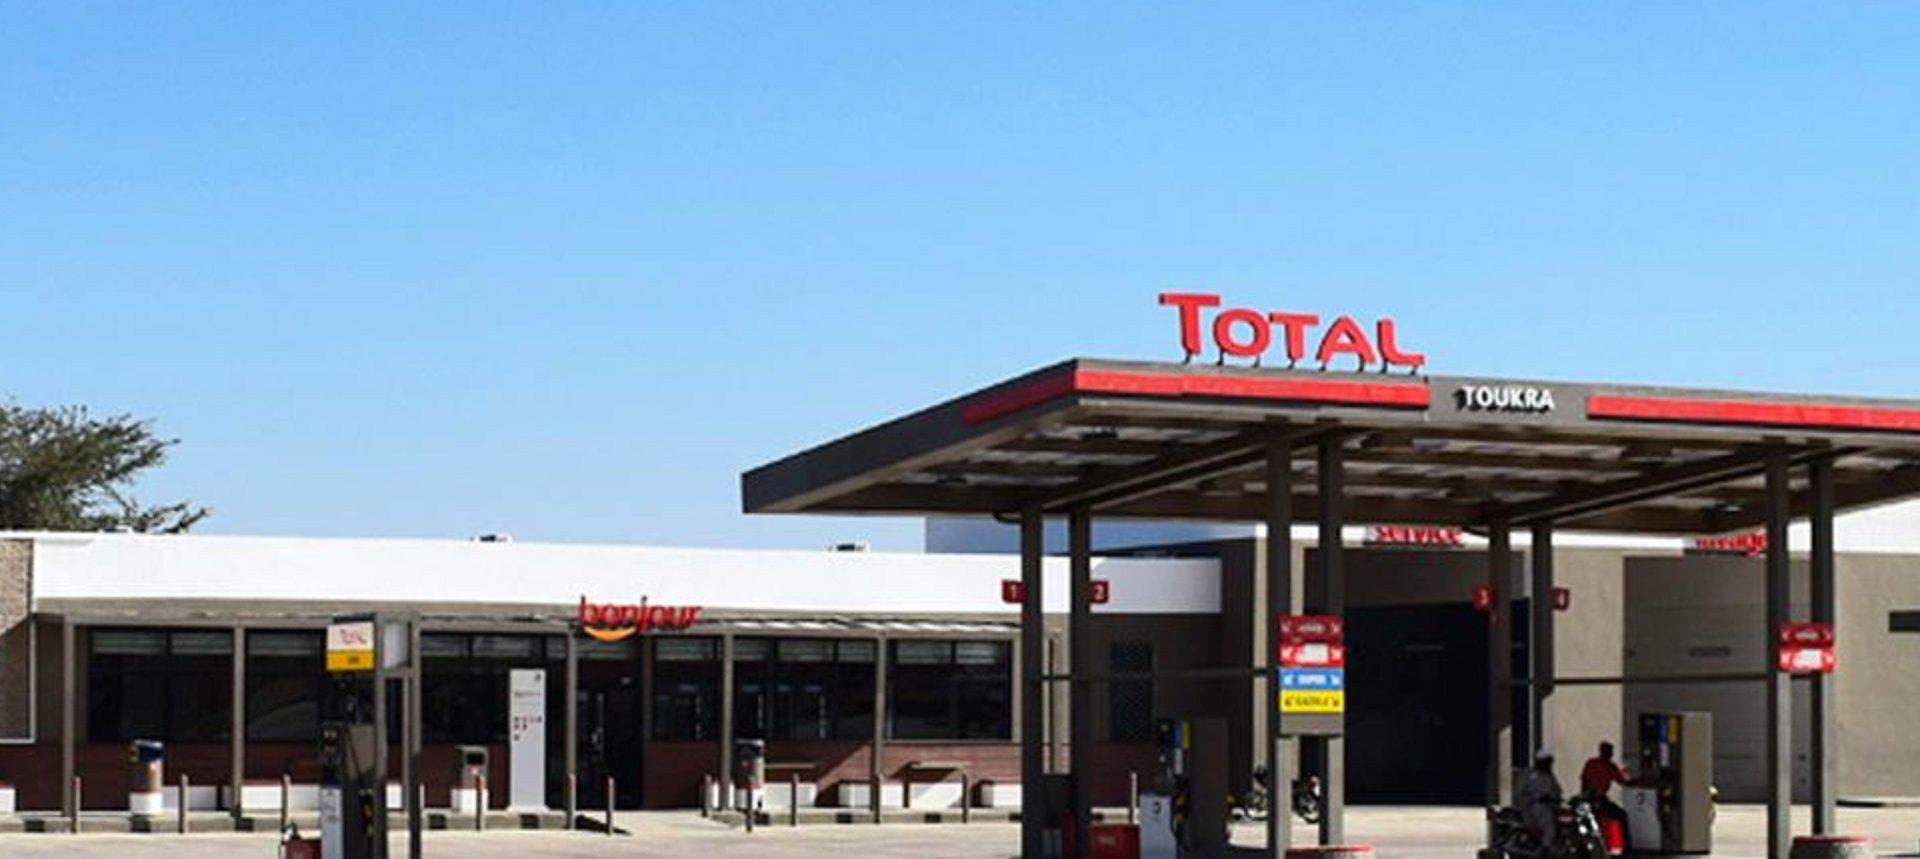 Total Marketing Tchad  ne fournira plus de gaz butane d'ici fin mars 1